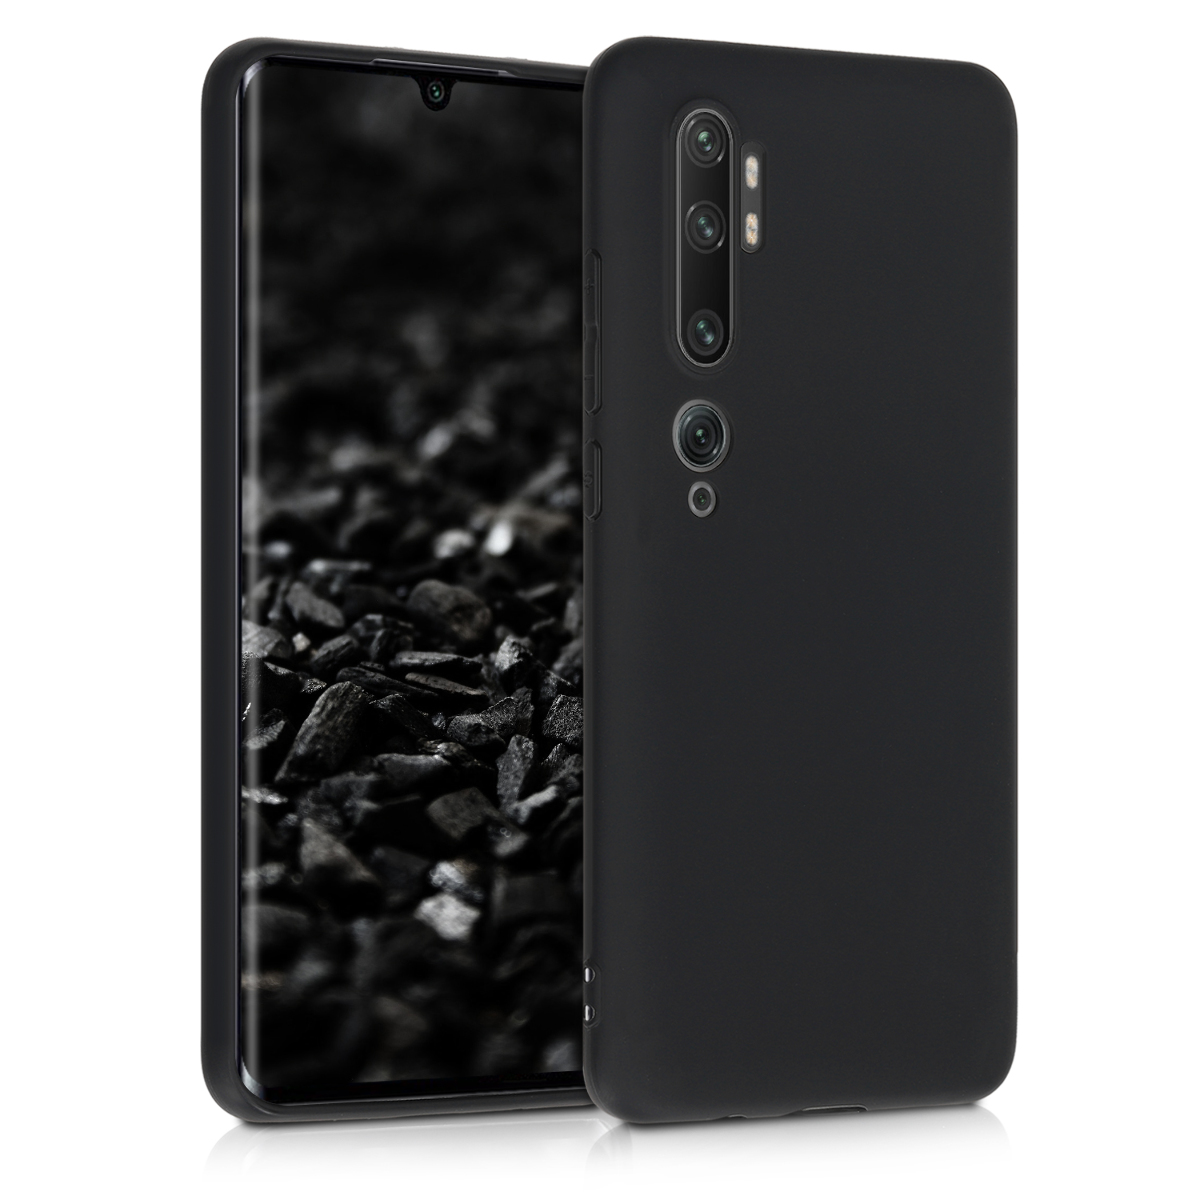 KW Θήκη Σιλικόνης Xiaomi Mi Note 10 / Note 10 Pro - Black Matte (50948.50)